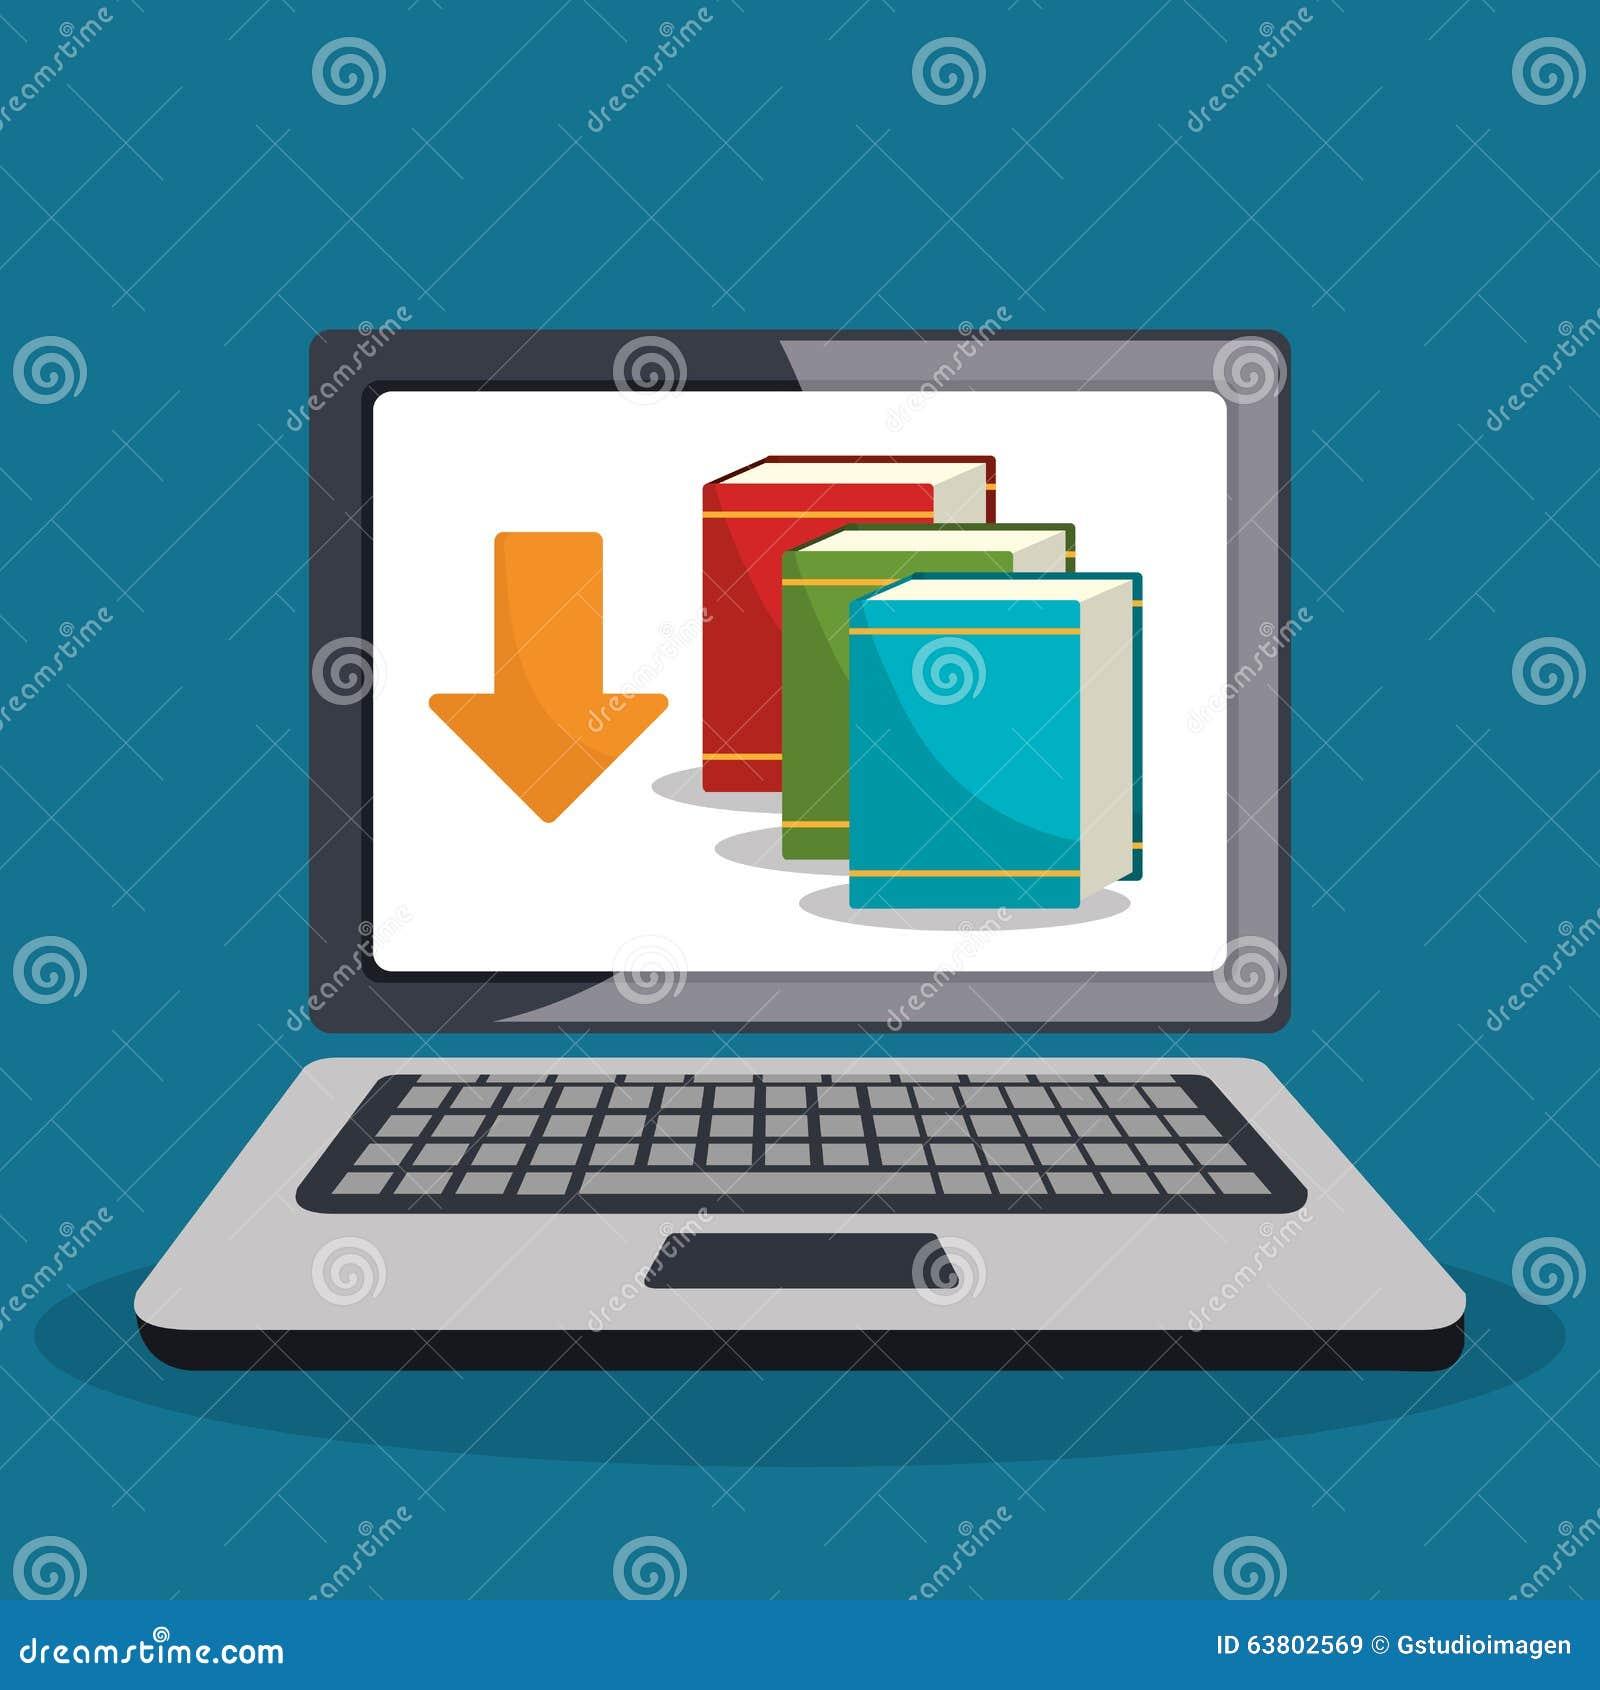 Hardware download computer ebook